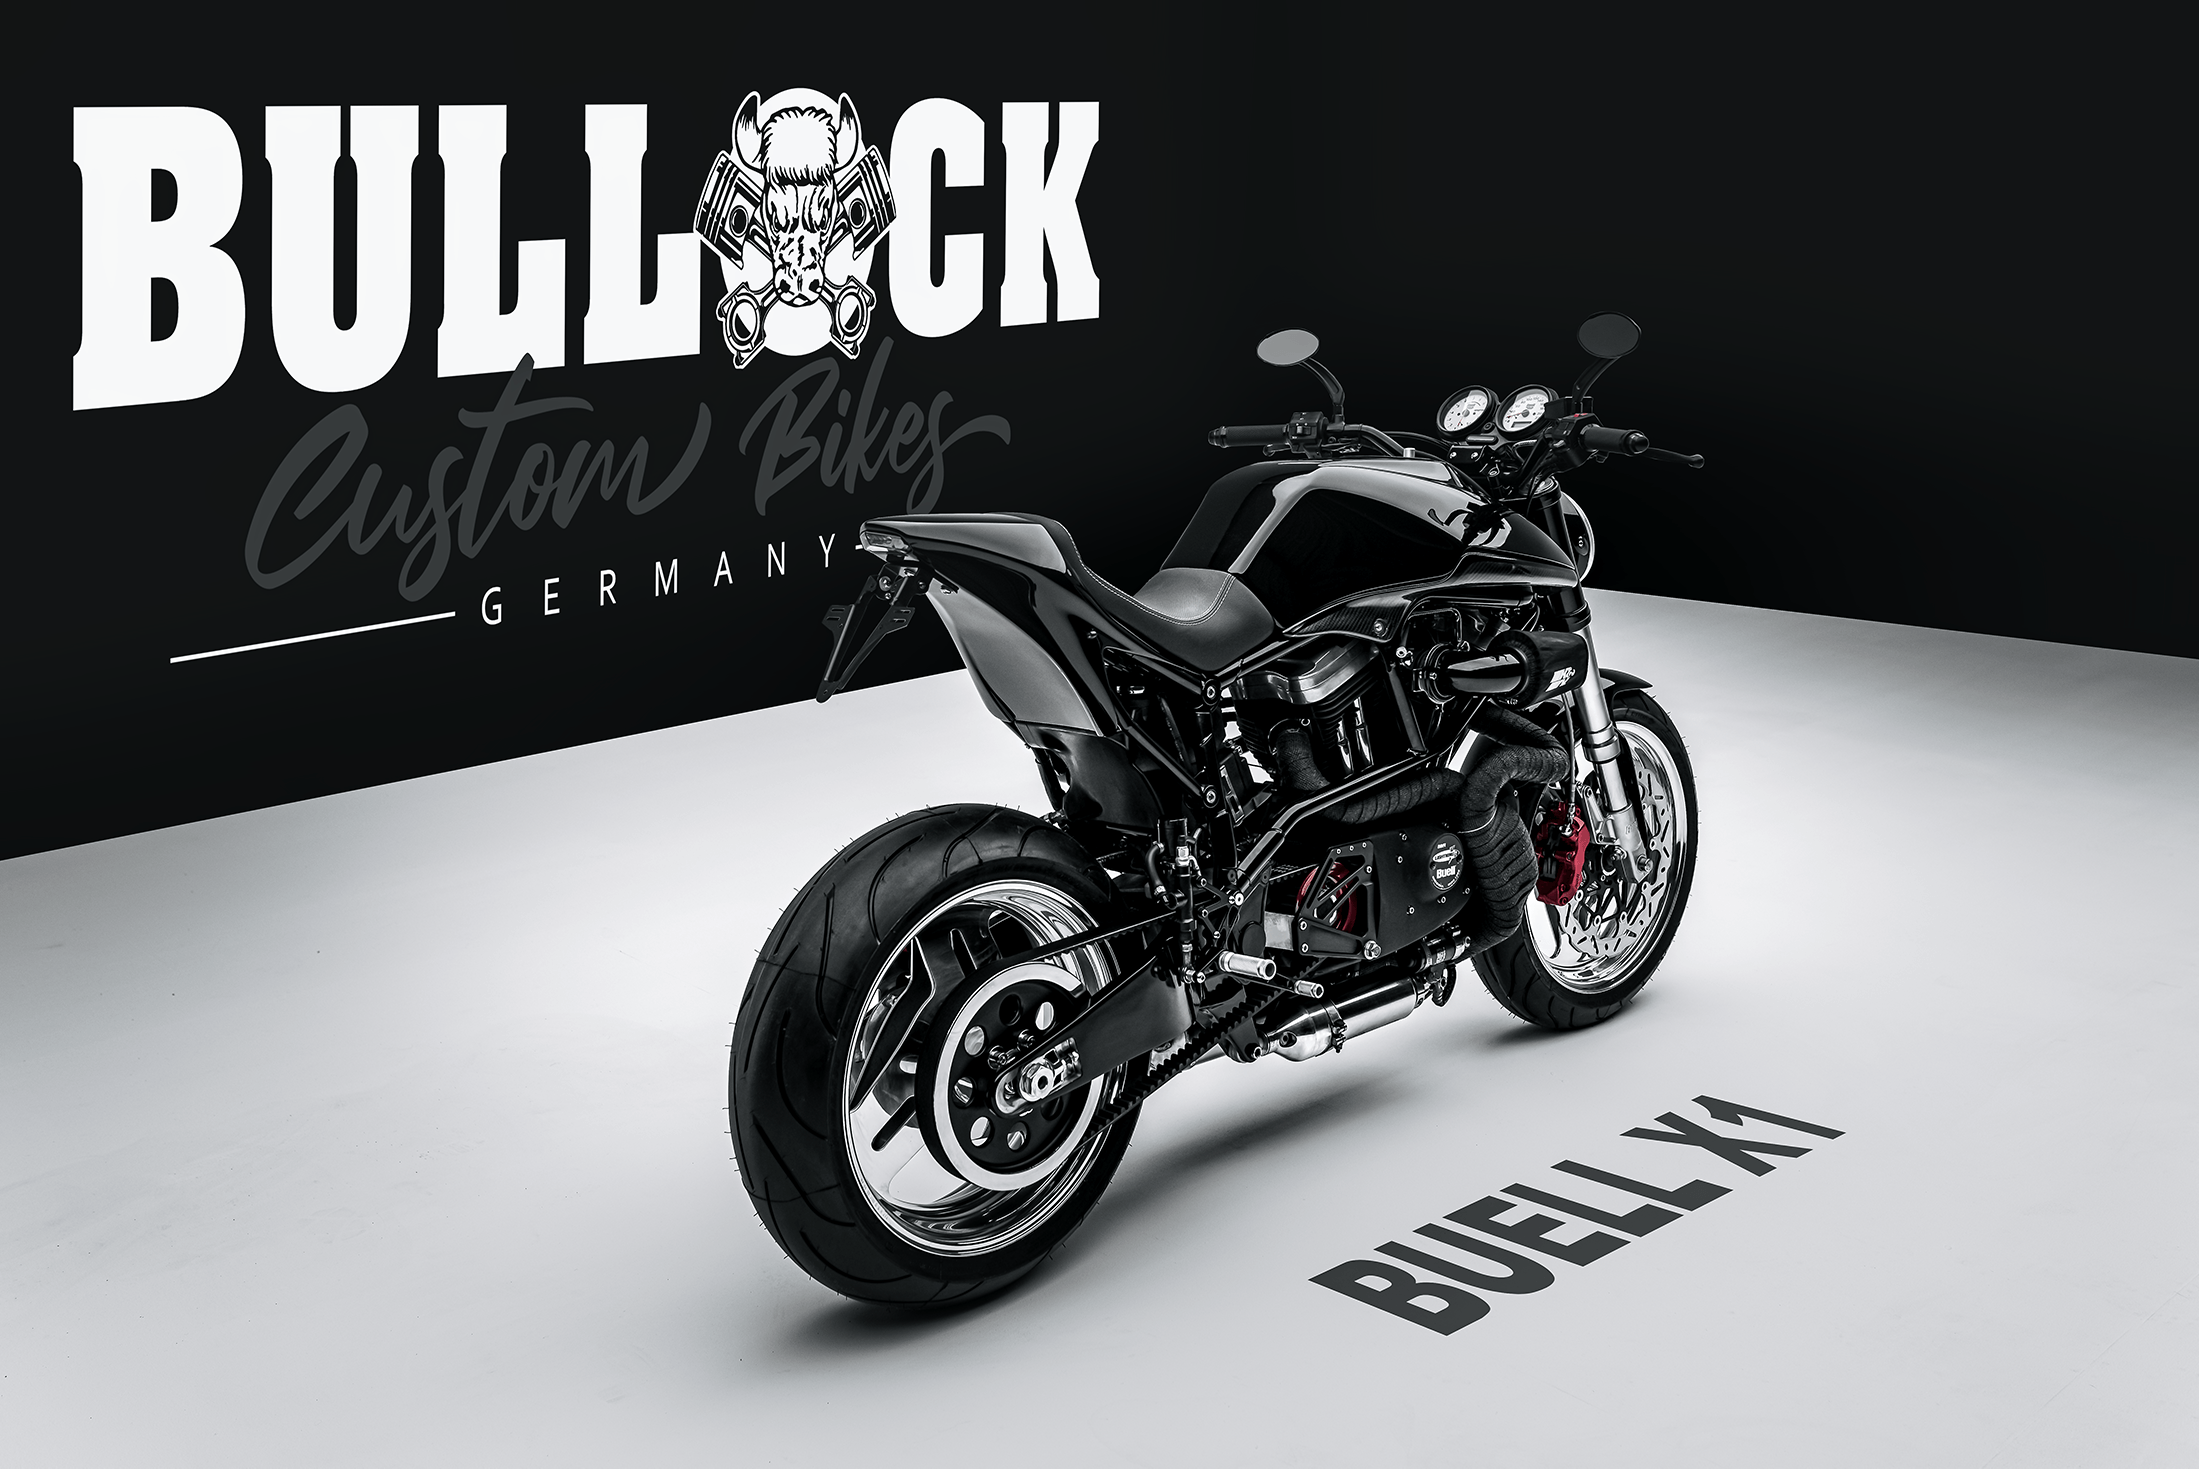 Bullock Custom Bikes Buell X1